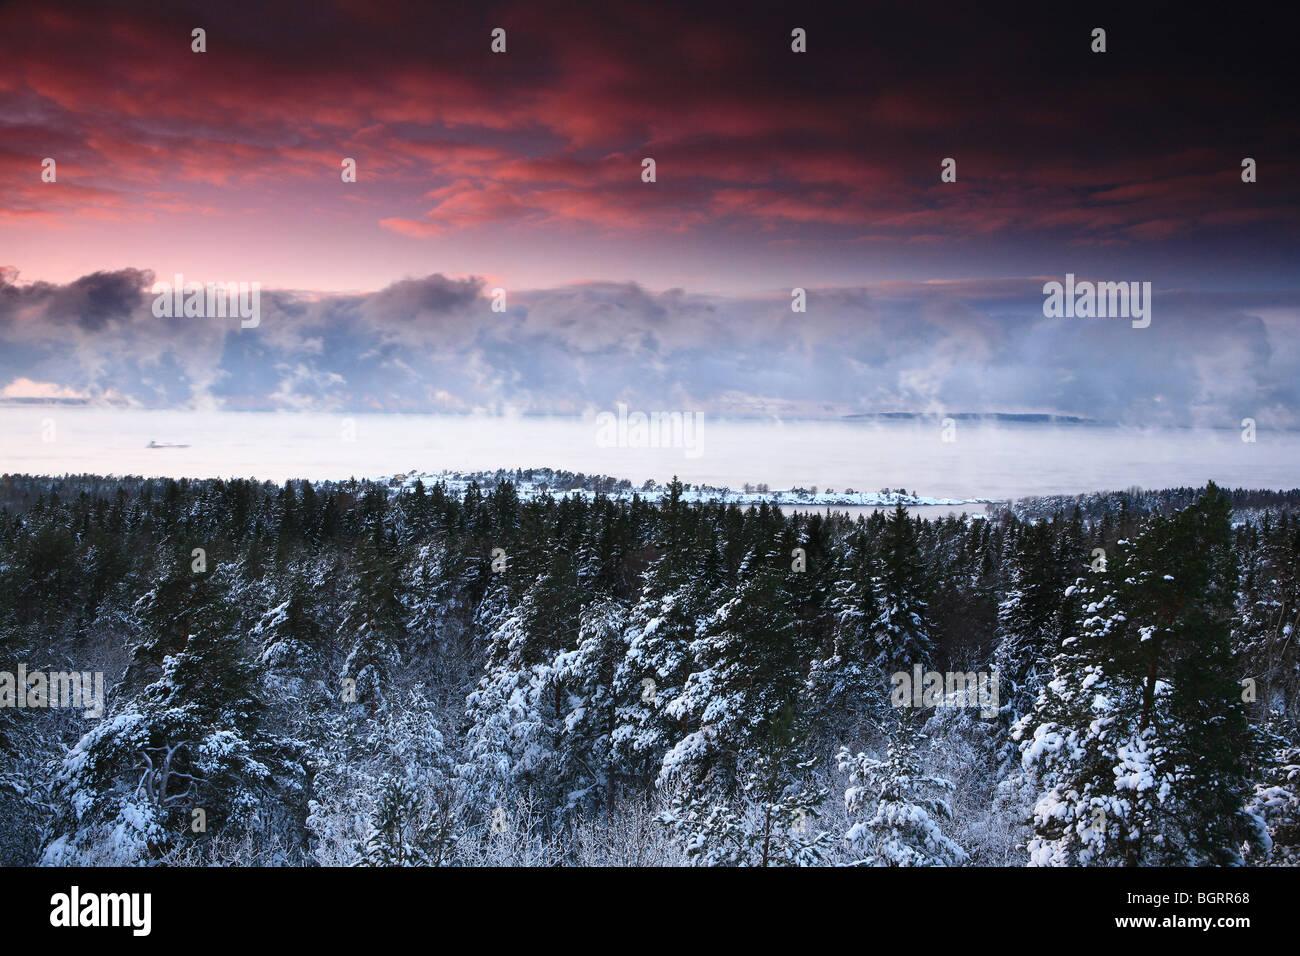 Winterlandschaft in Rygge Kommune, Østfold Fylke, Norwegen vom Vardåsen gesehen. Stockbild